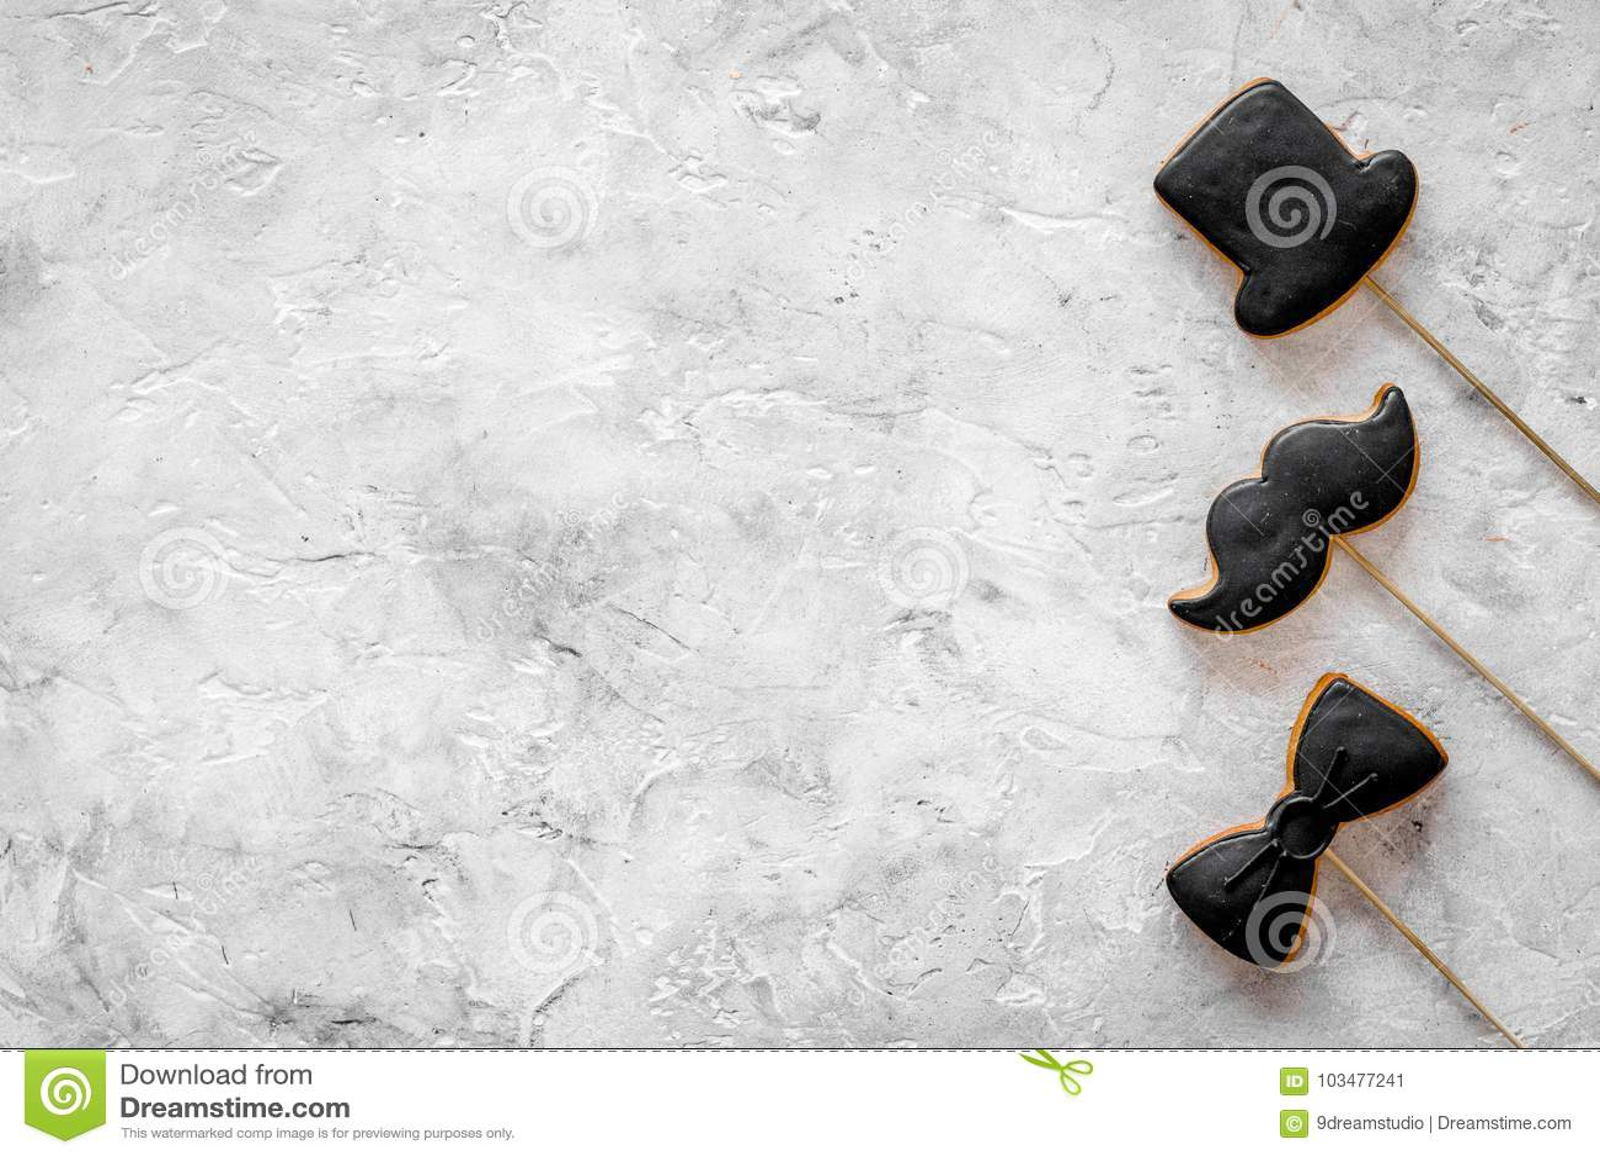 https www dreamstime com men birthday concept set cookies shape black tie mustache hat grey stone background top view copyspace men birthday image103477241